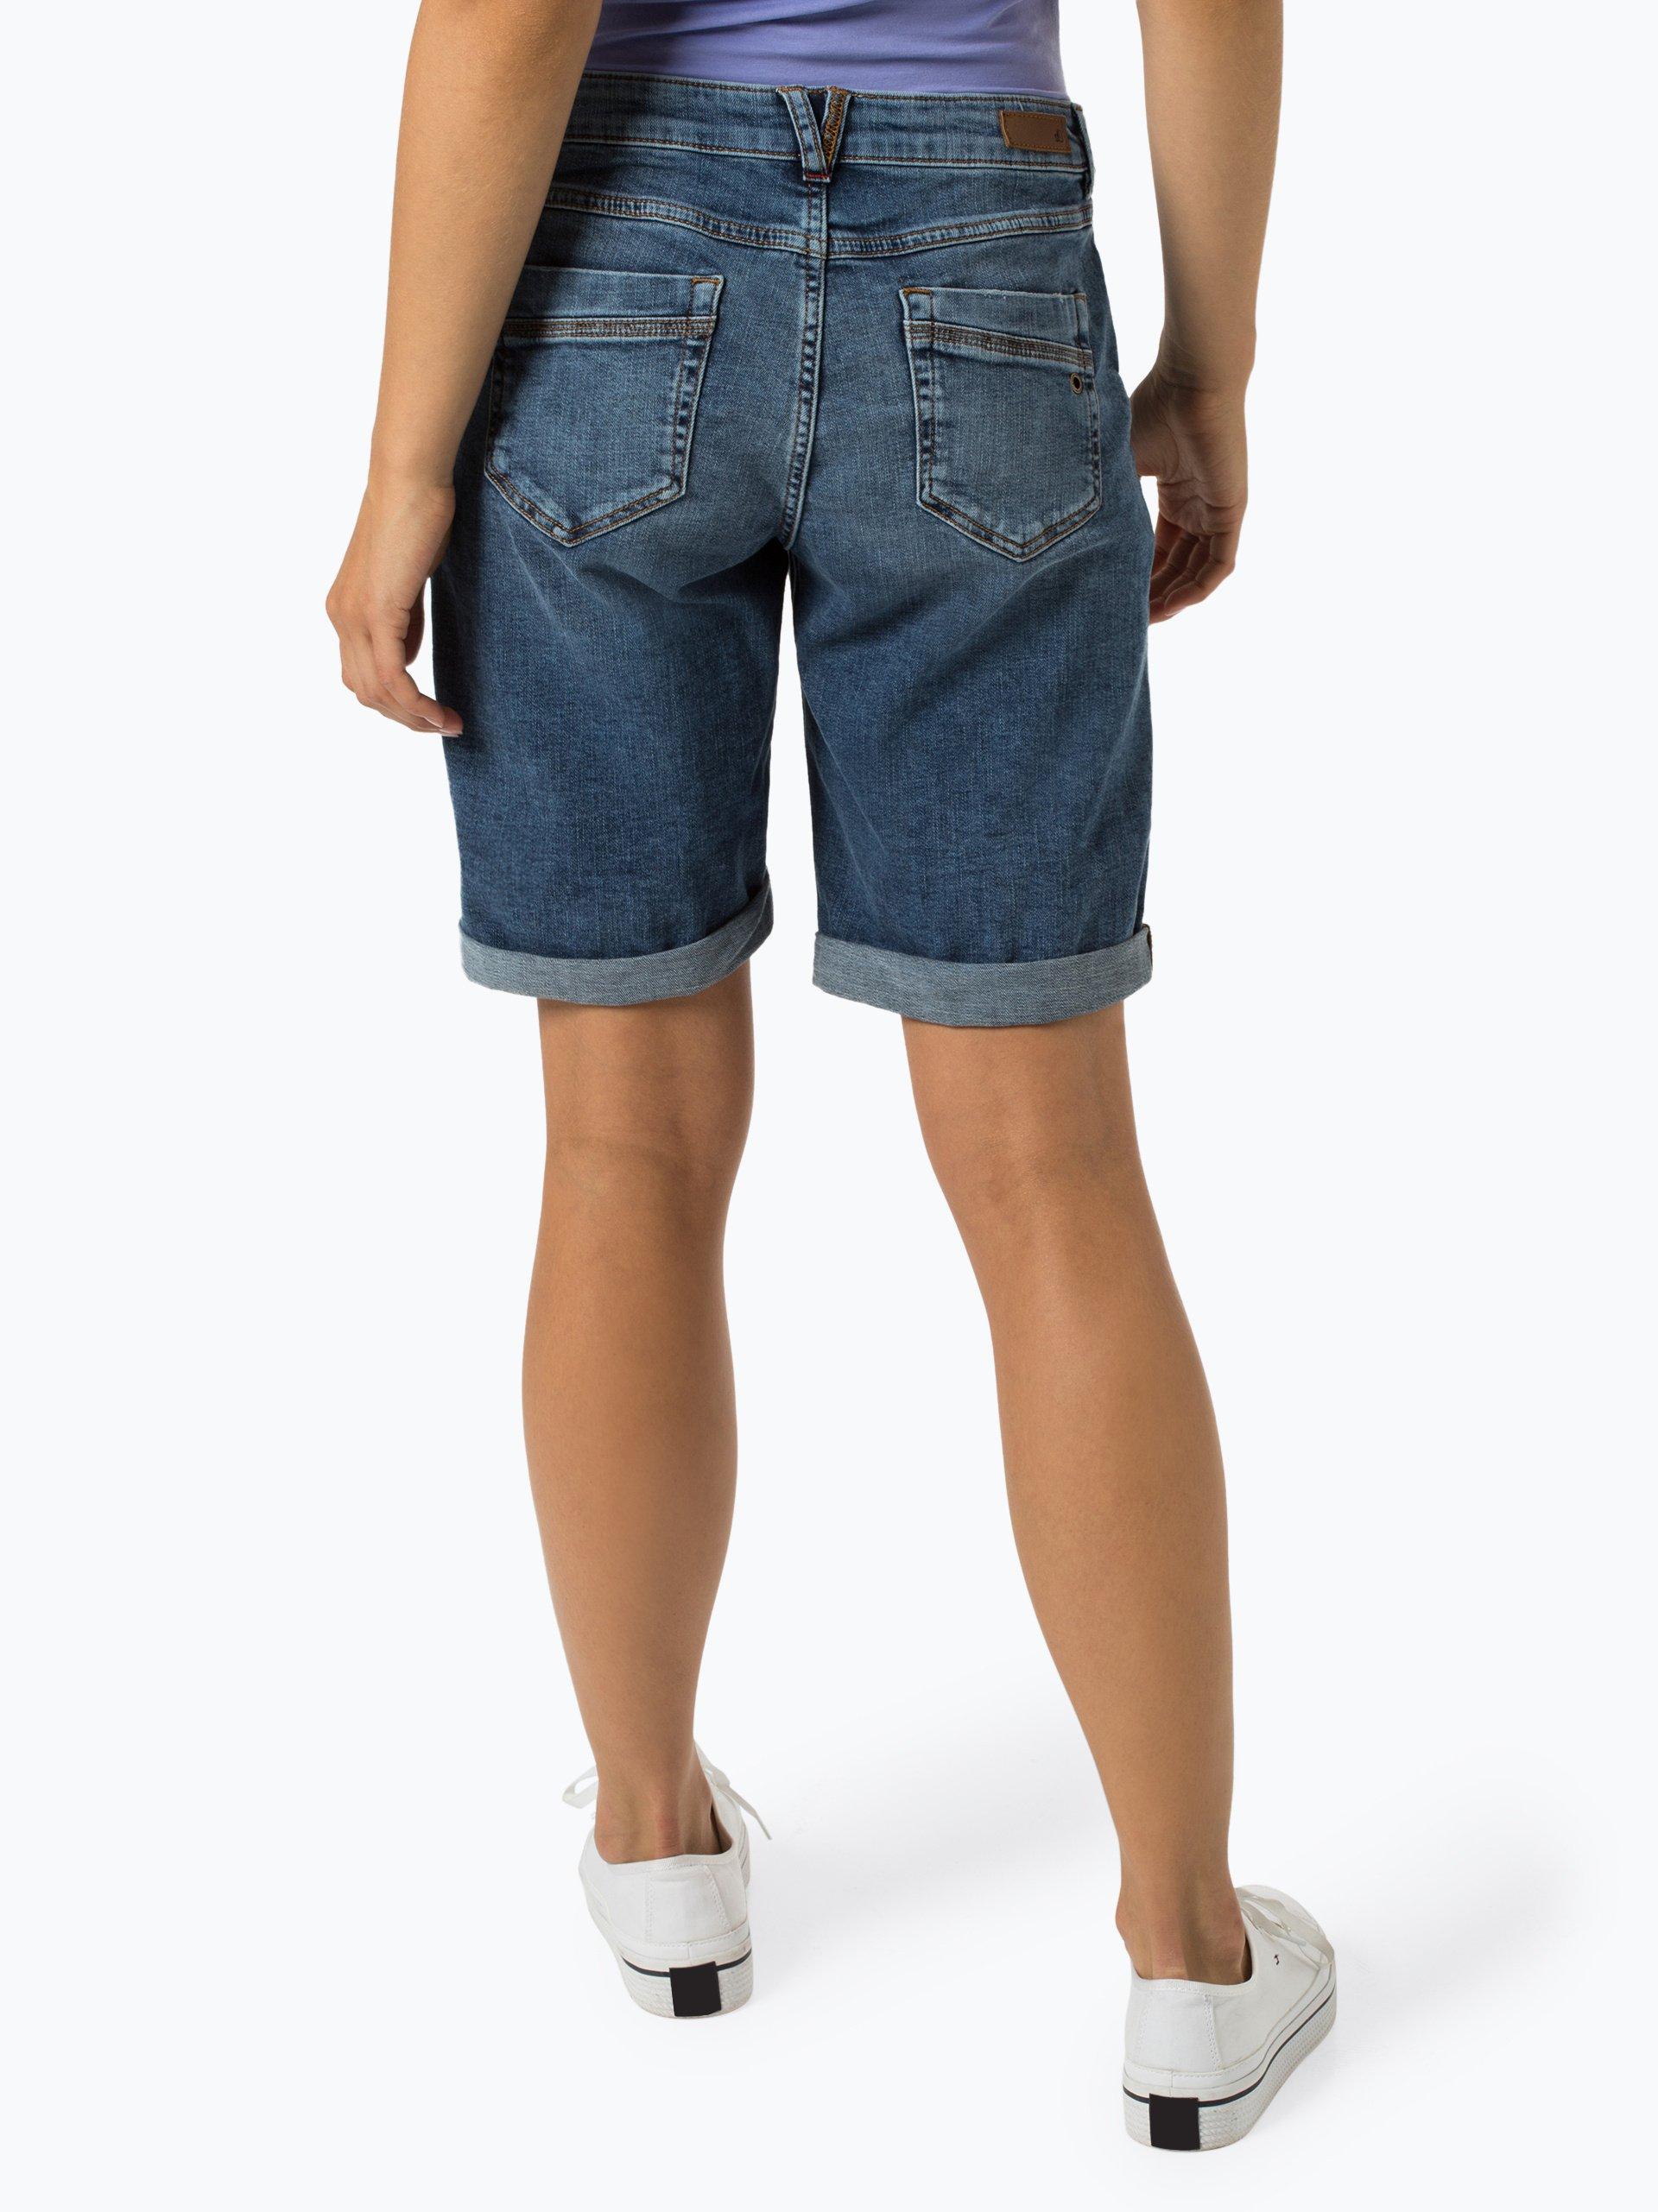 s.Oliver Casual Damen Jeansshorts - Smart Bermuda